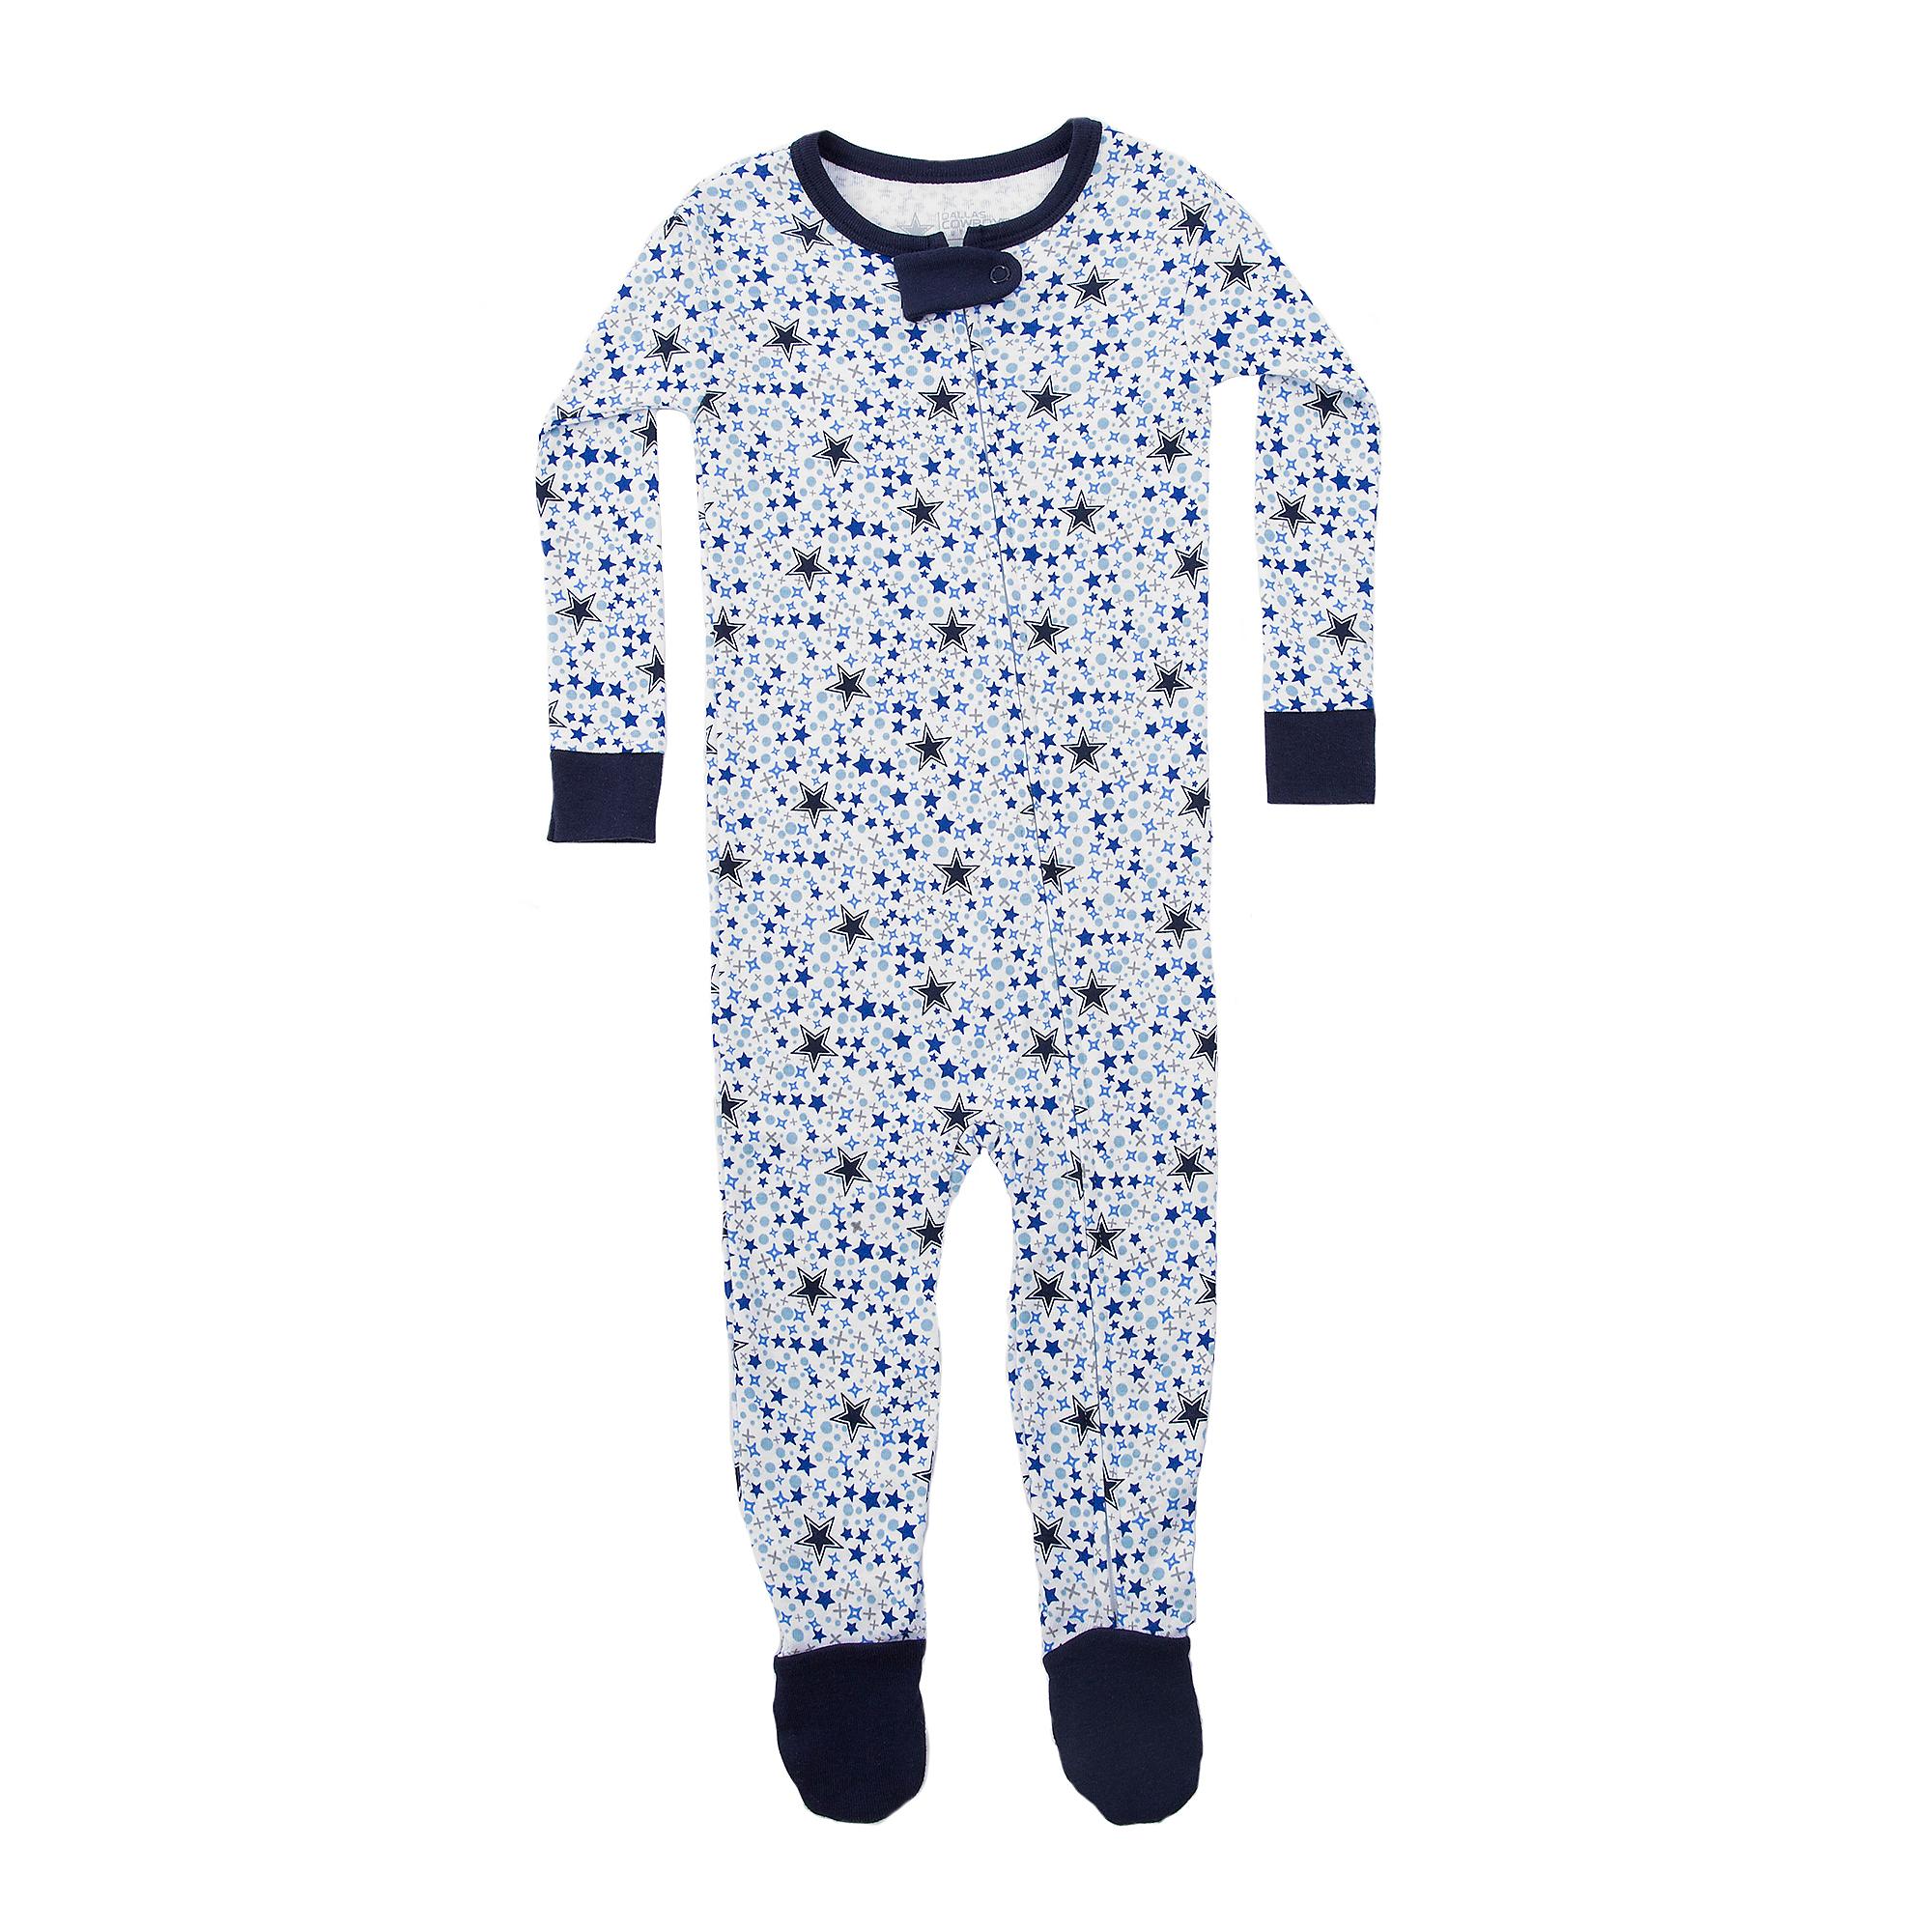 Dallas Cowboys Infant Dobbin Sleep Set